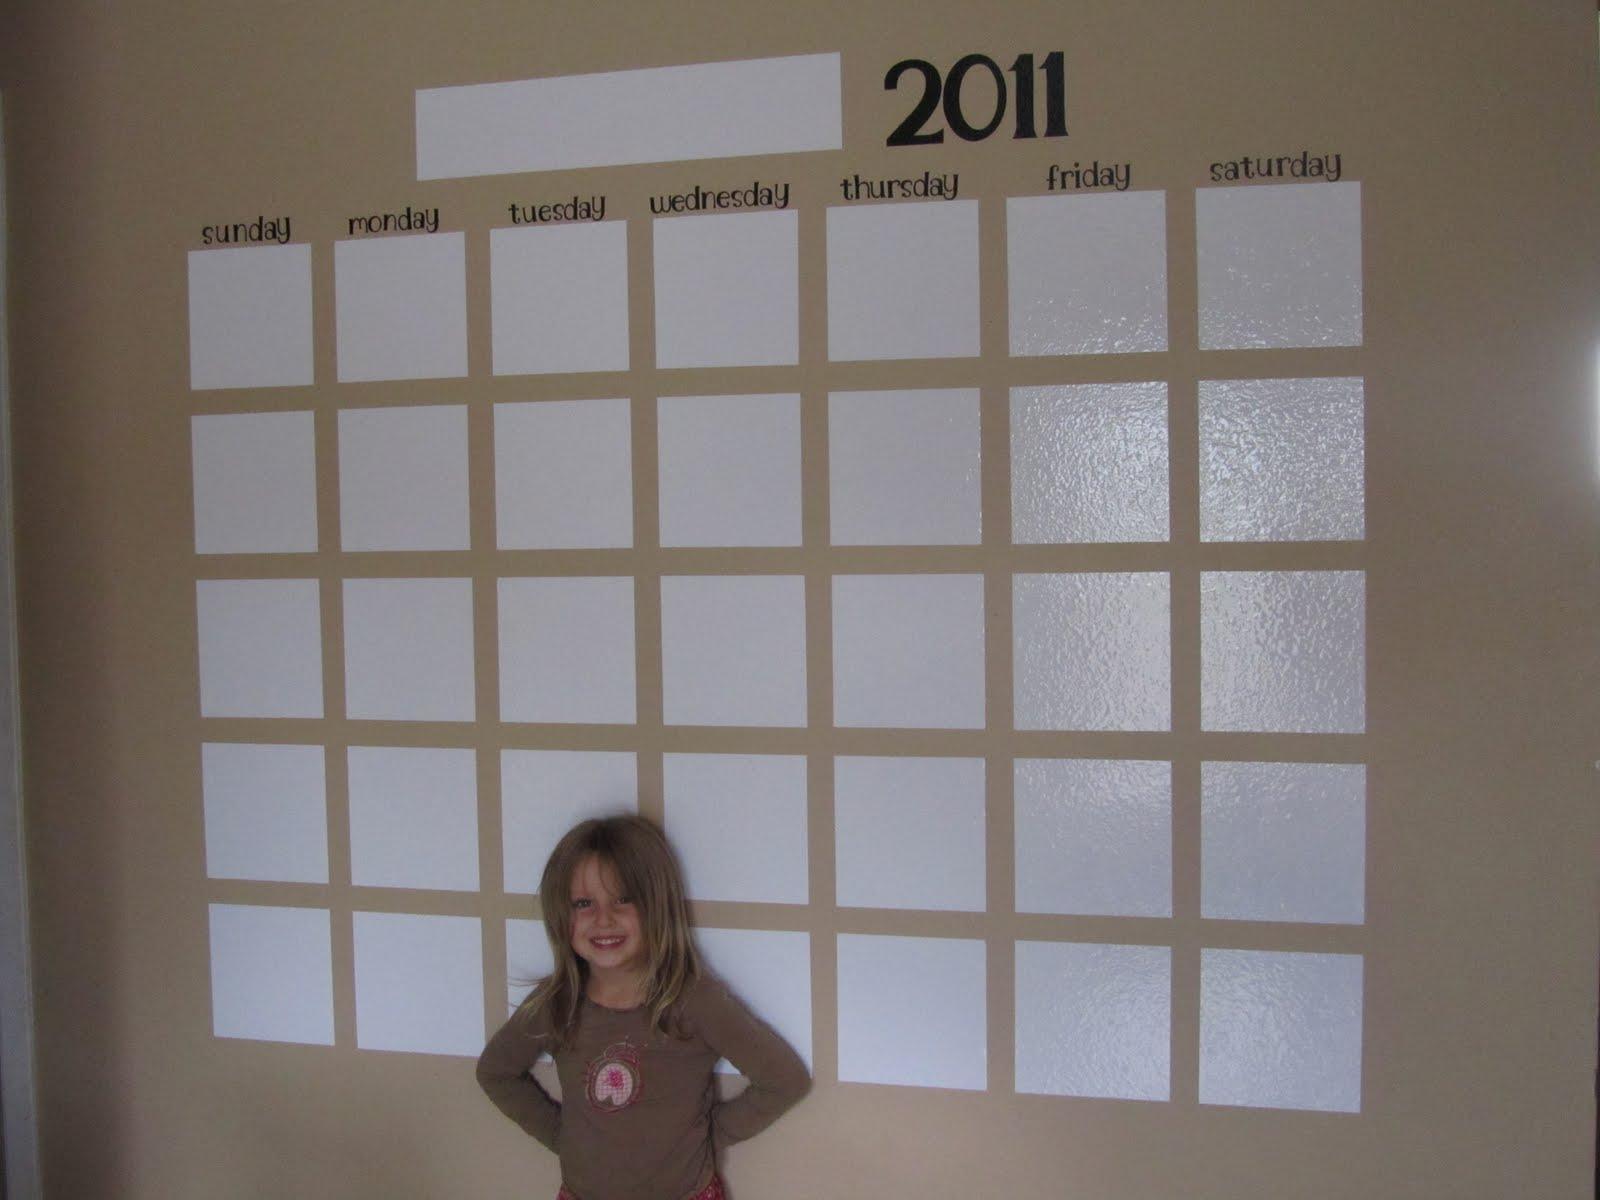 at a glance calendars, school calendars, planning calendars, church calendar, erasable calendars, yearly calendars, at a glance wall calendars, dry erase yearly calendar, wall planner calendars.